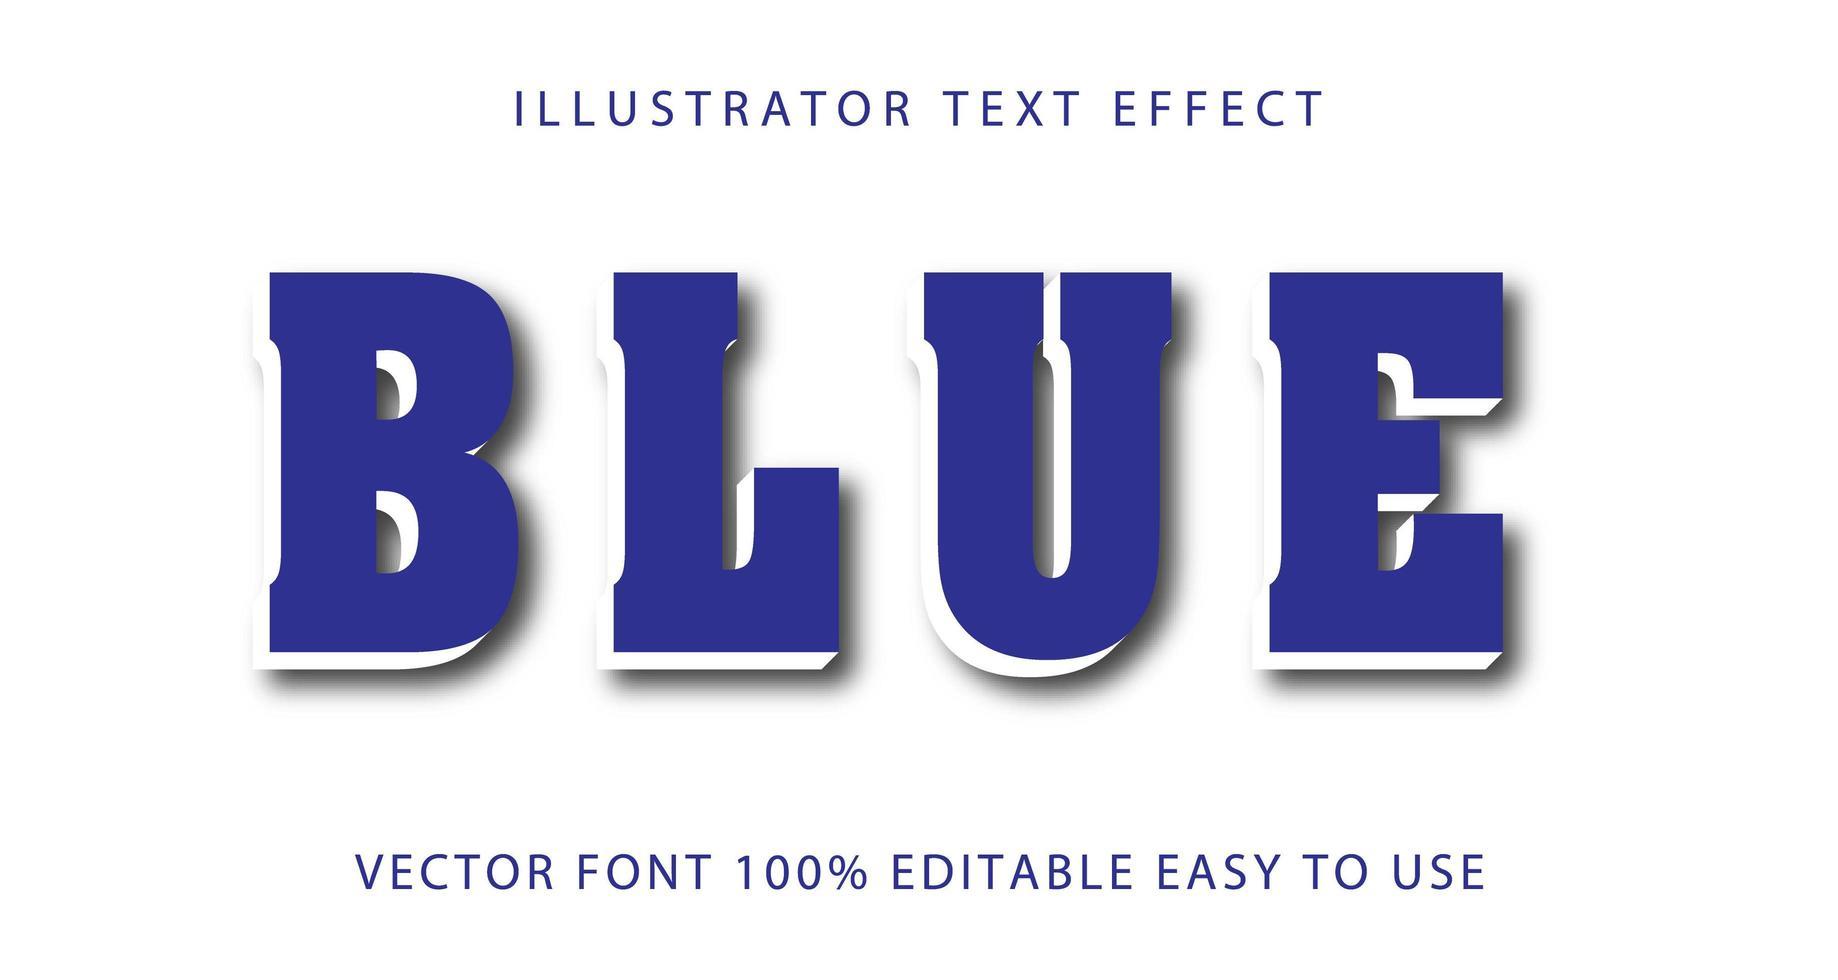 blauw, wit accent teksteffect vector